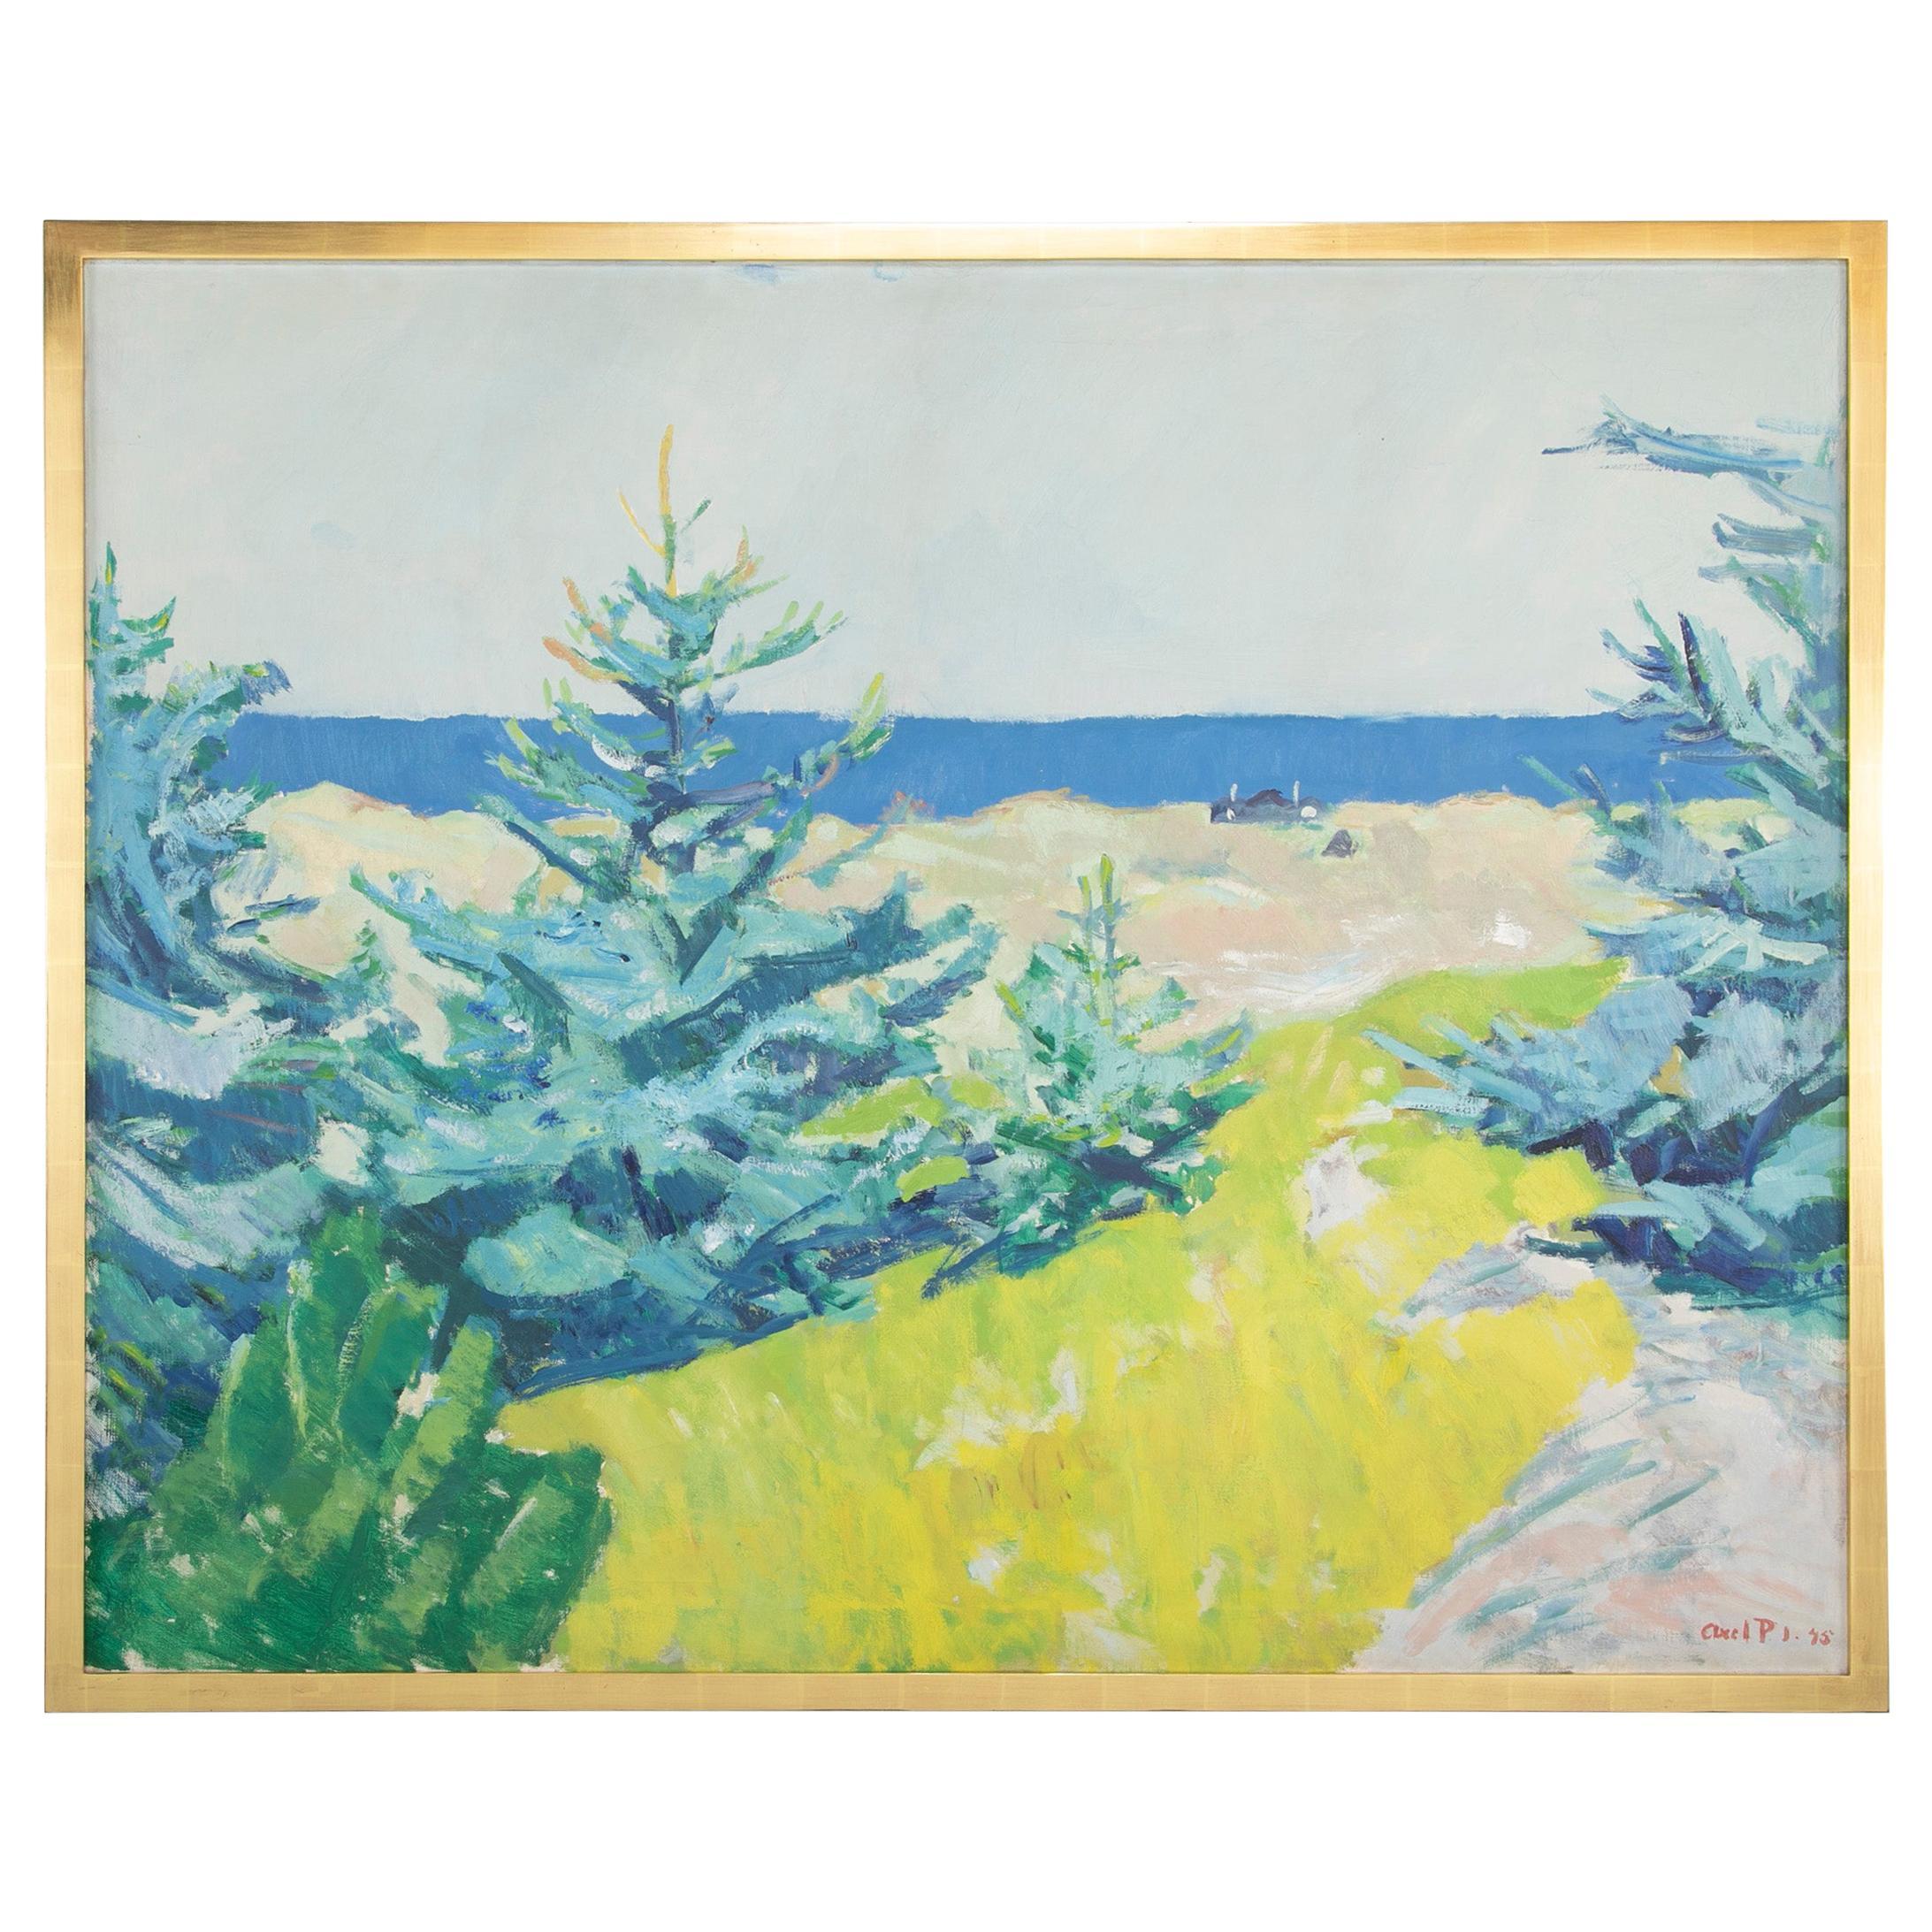 Oil on Canvas by Danish Artist Axel P. Jensen